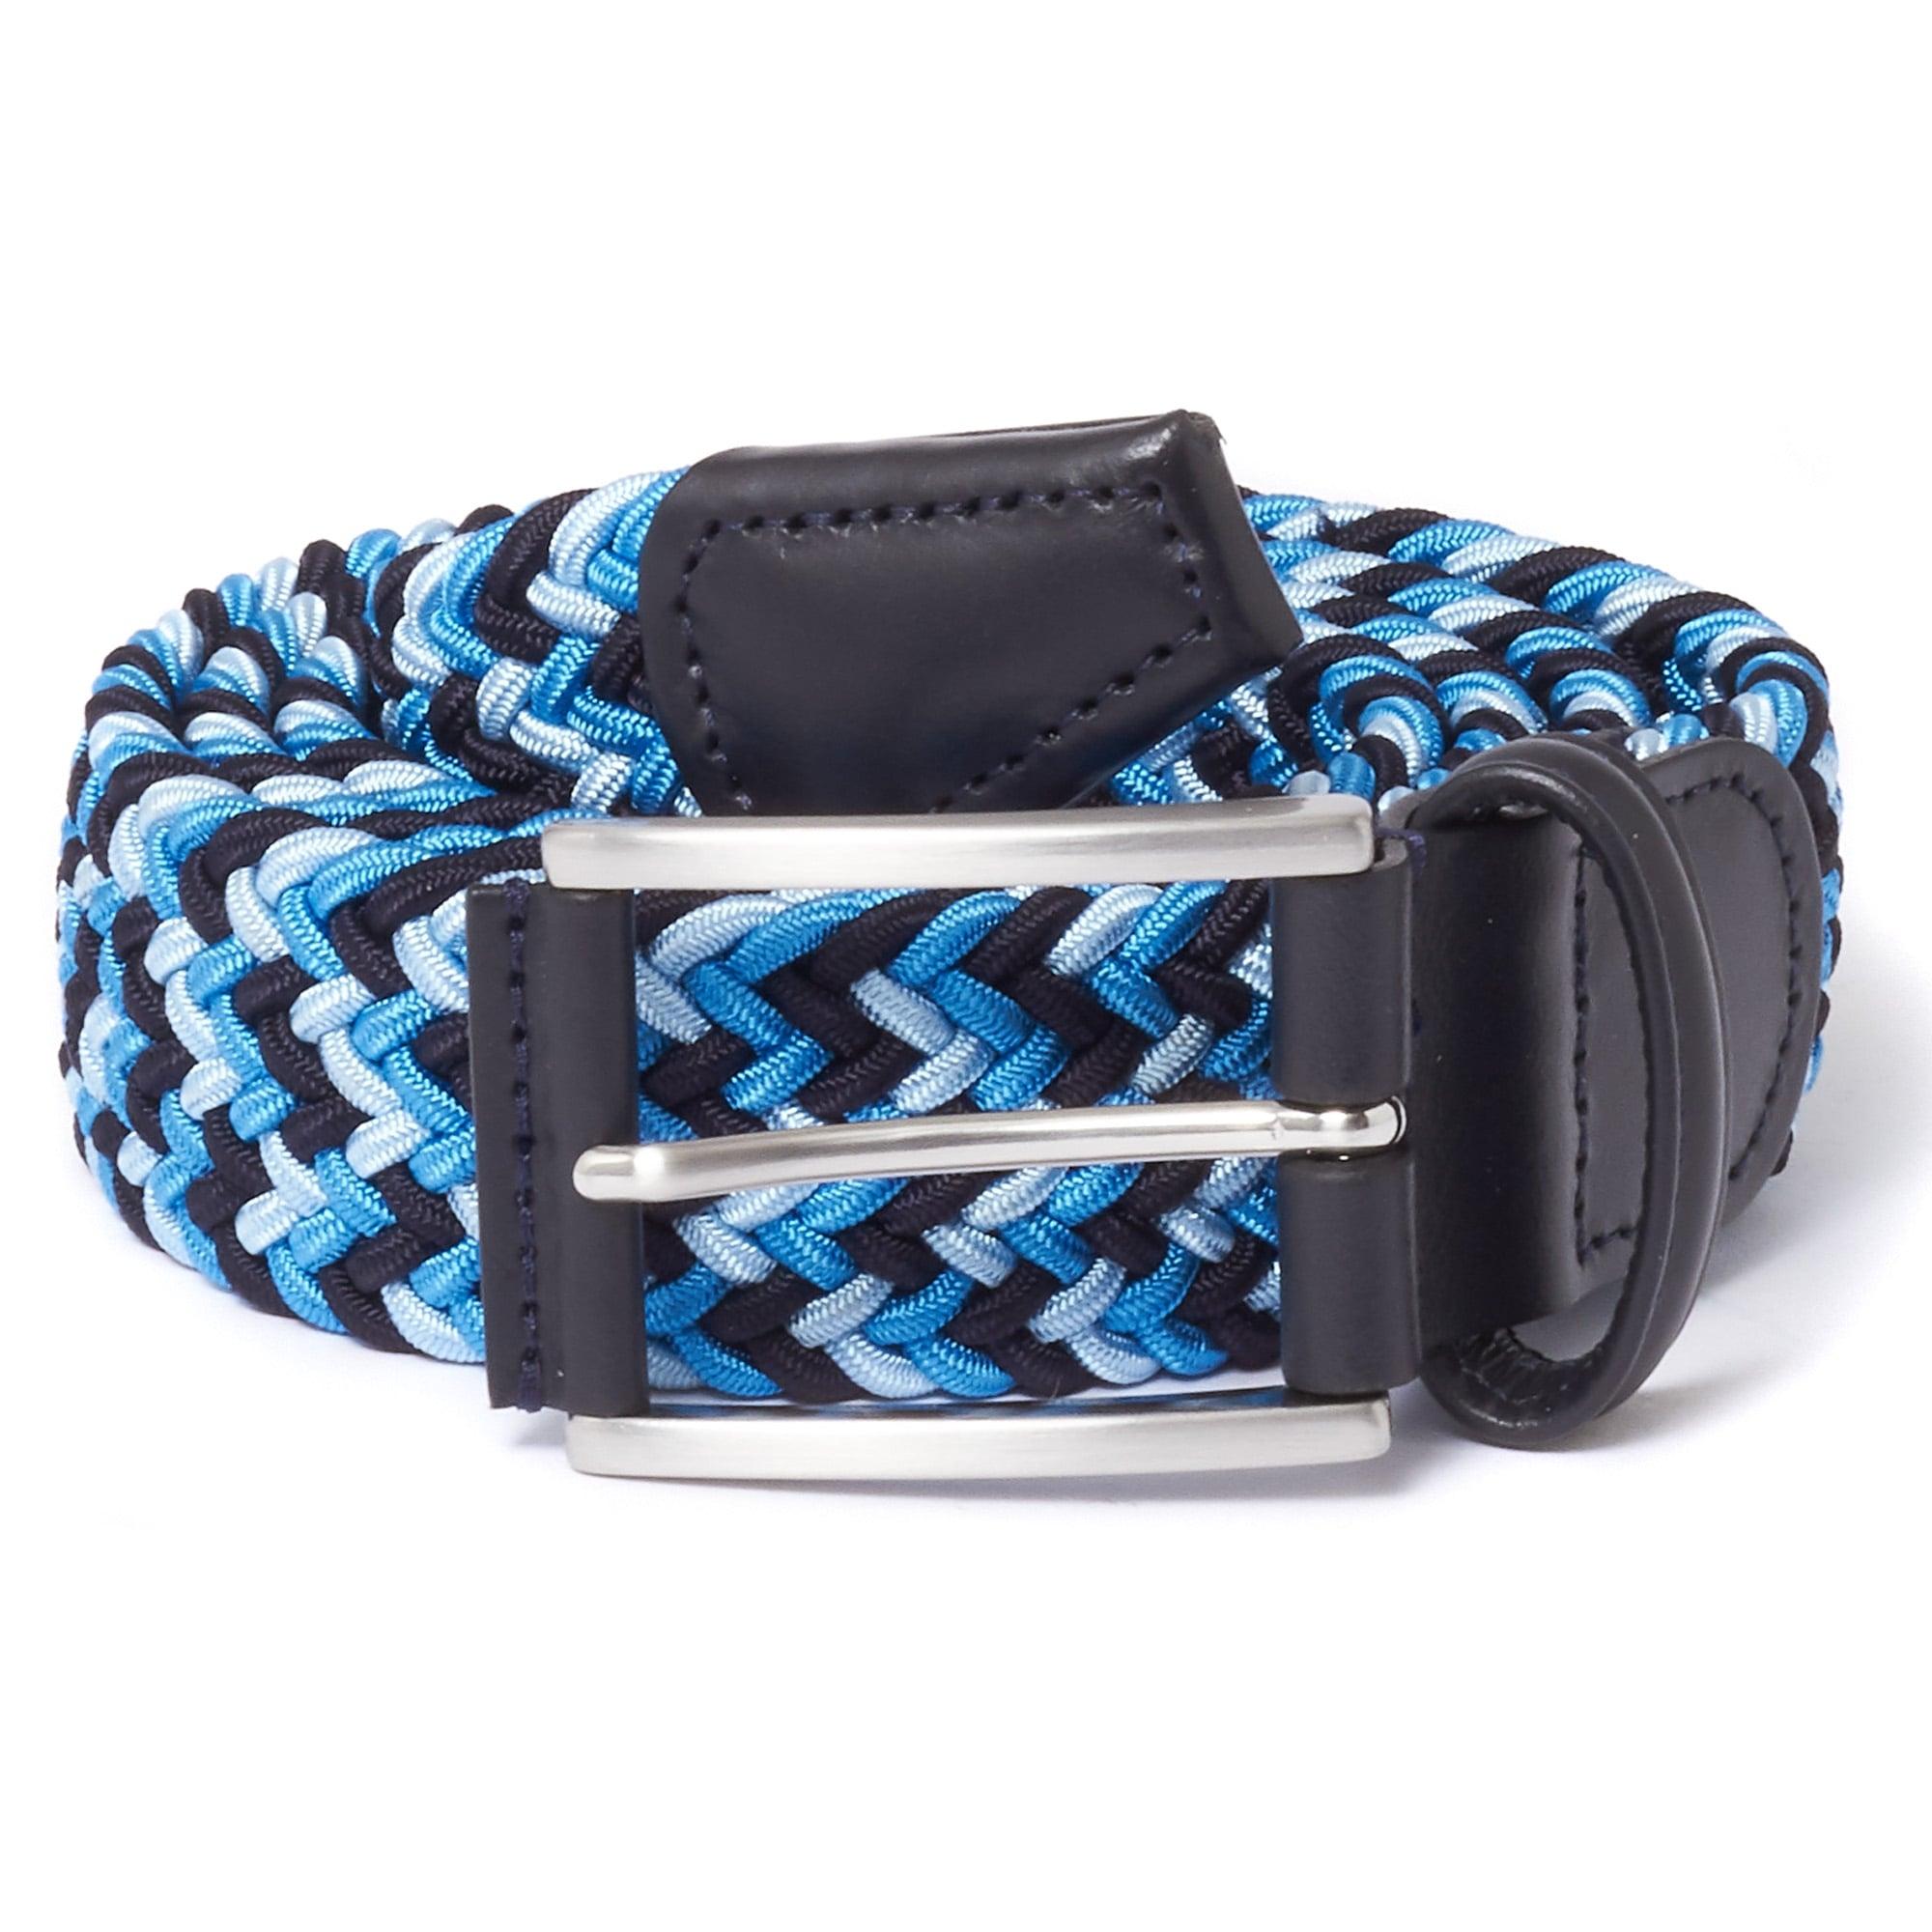 Anderson's blue woven belt